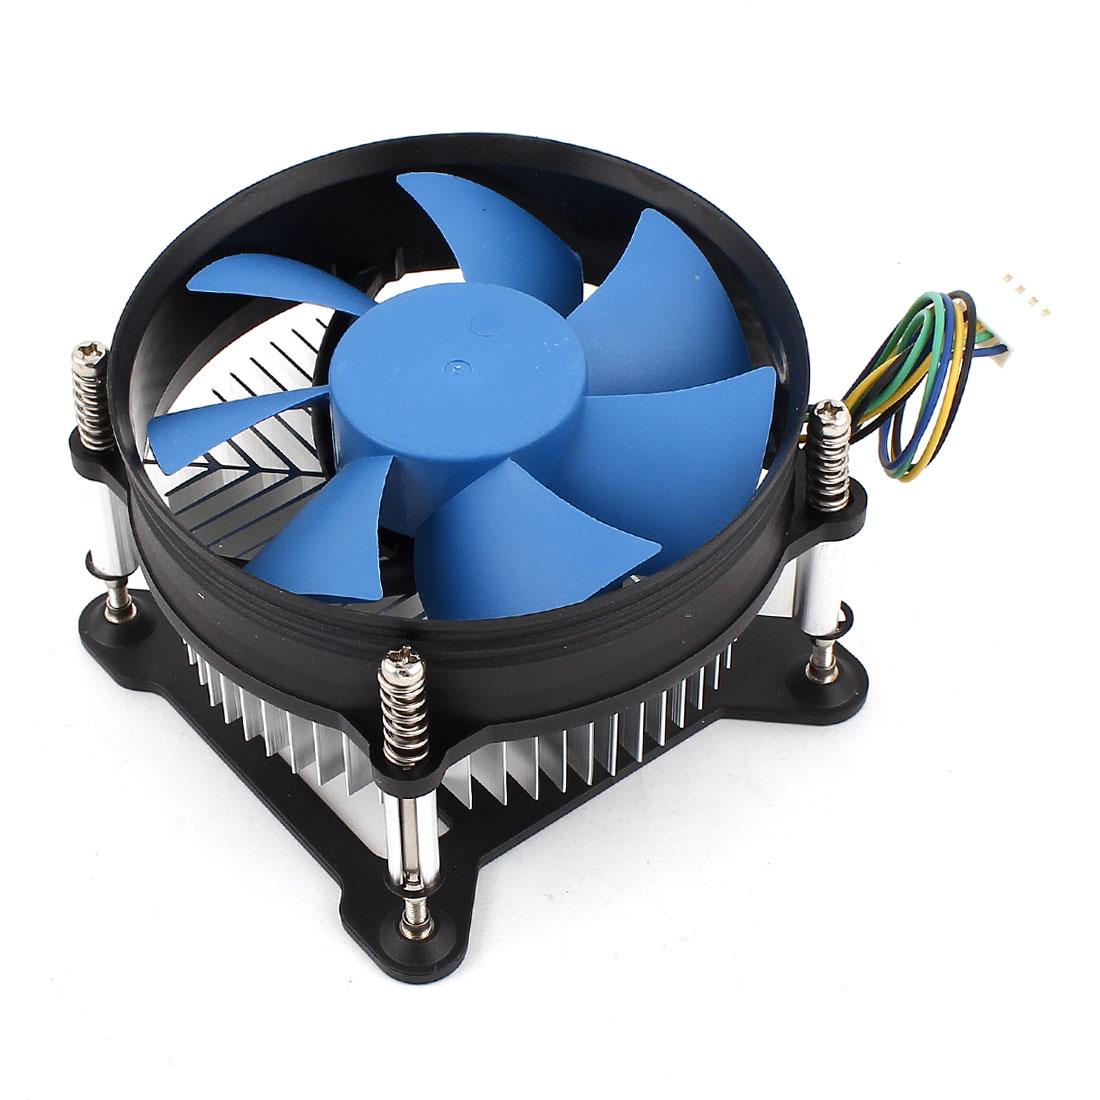 Computer PC Cooling Fan CPU Heatsink Cooler 4Pin 12V for Intel LGA1155/1156